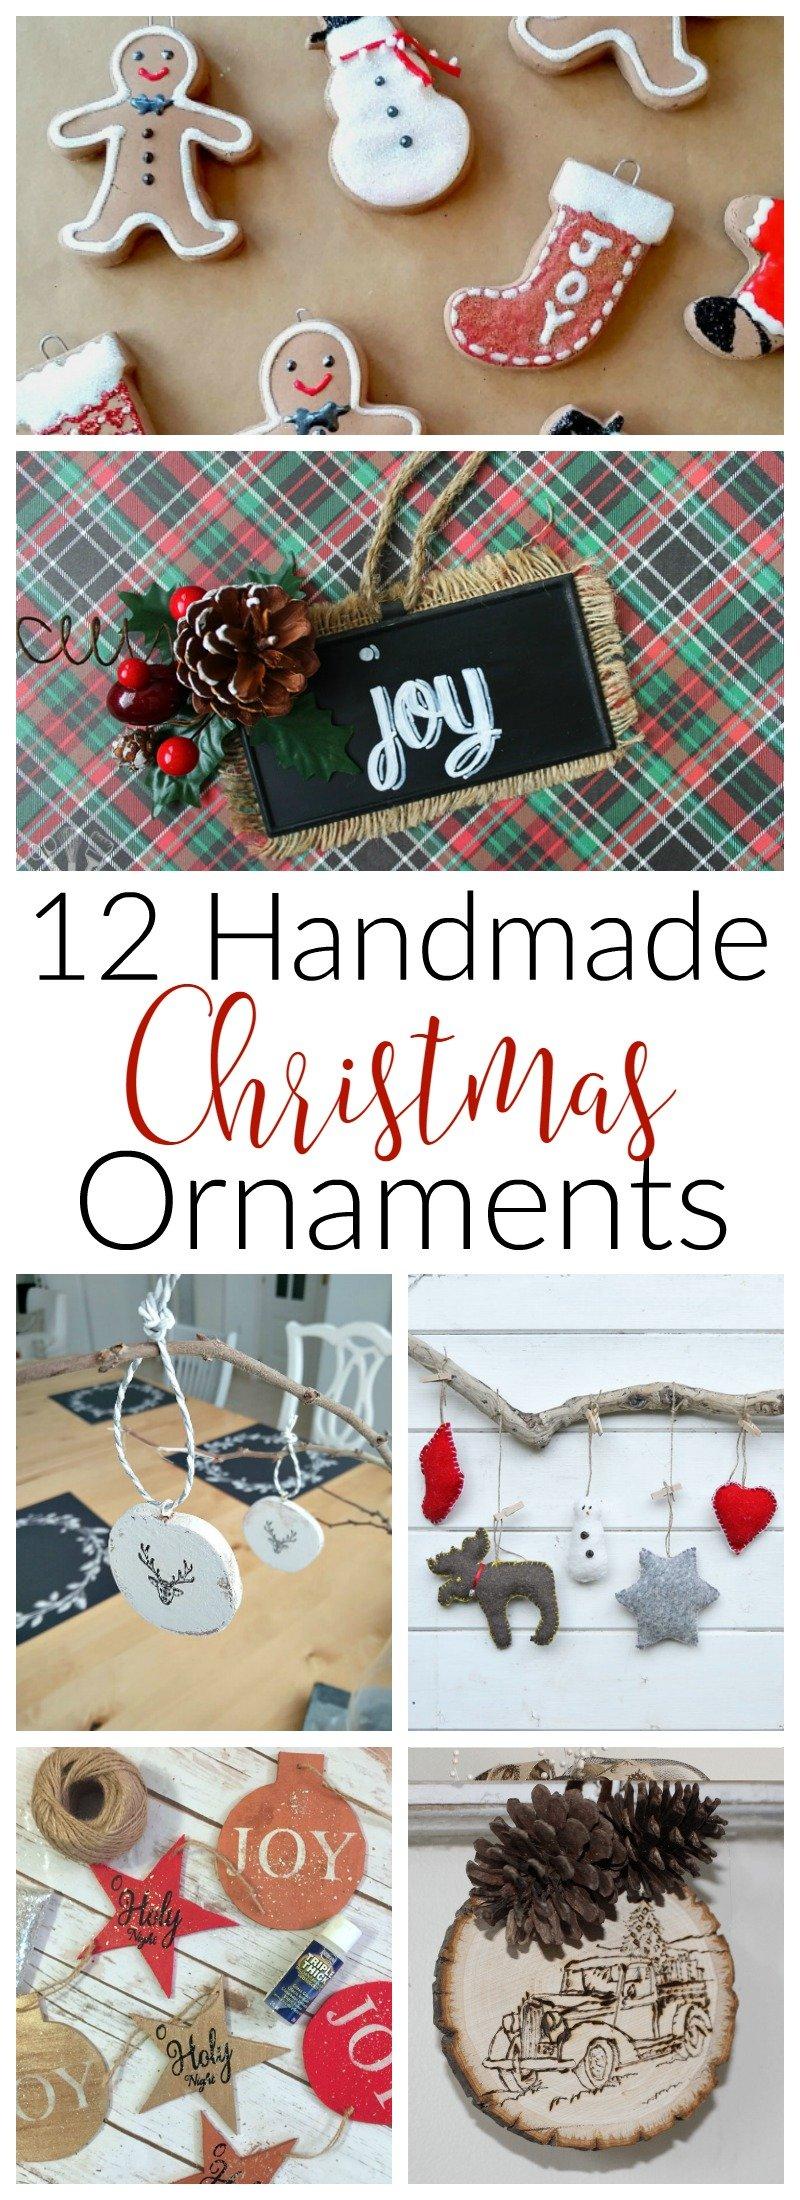 12 DIY Handmade Christmas Ornaments, chalkboard, deers, gingerbread man, bottle brush, Santa, Wood slice, felt and more